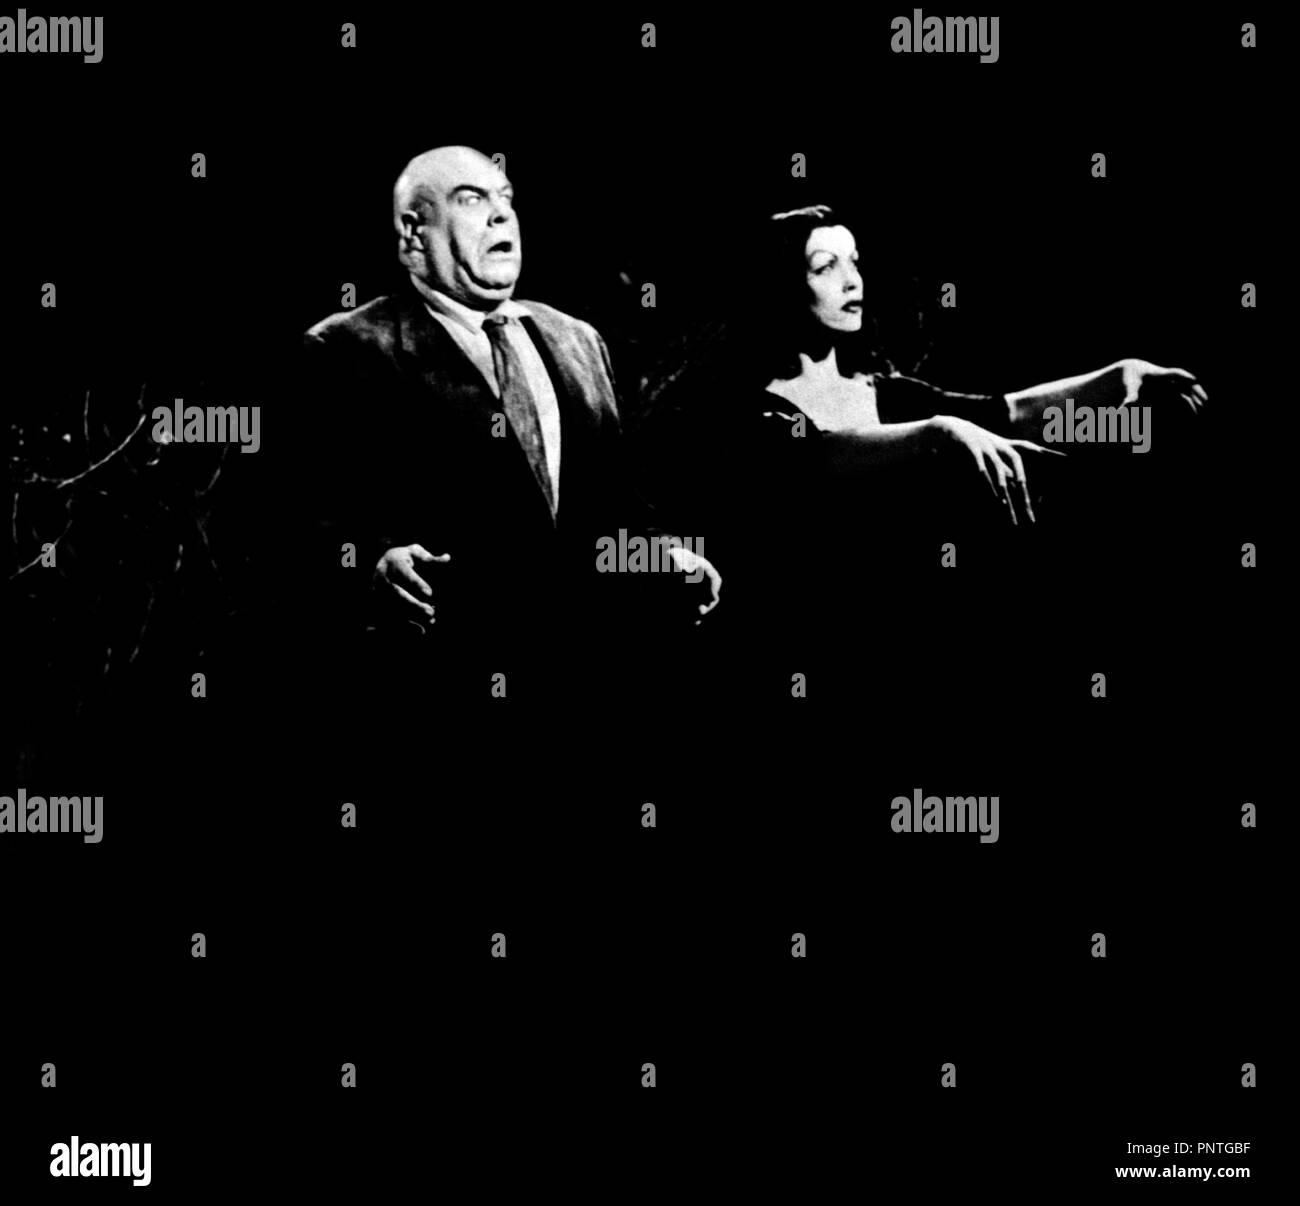 Prod DB © Reynolds Pictures / DR PLAN 9 FROM OUTER SPACE (PLAN 9 FROM OUTER SPACE) de Ed Wood 1958 USA science-fiction, sŽrie B avec Tor Johnson et Vampira transe, hypnose rŽalisateur: Edward D. Wood Jr - Stock Image